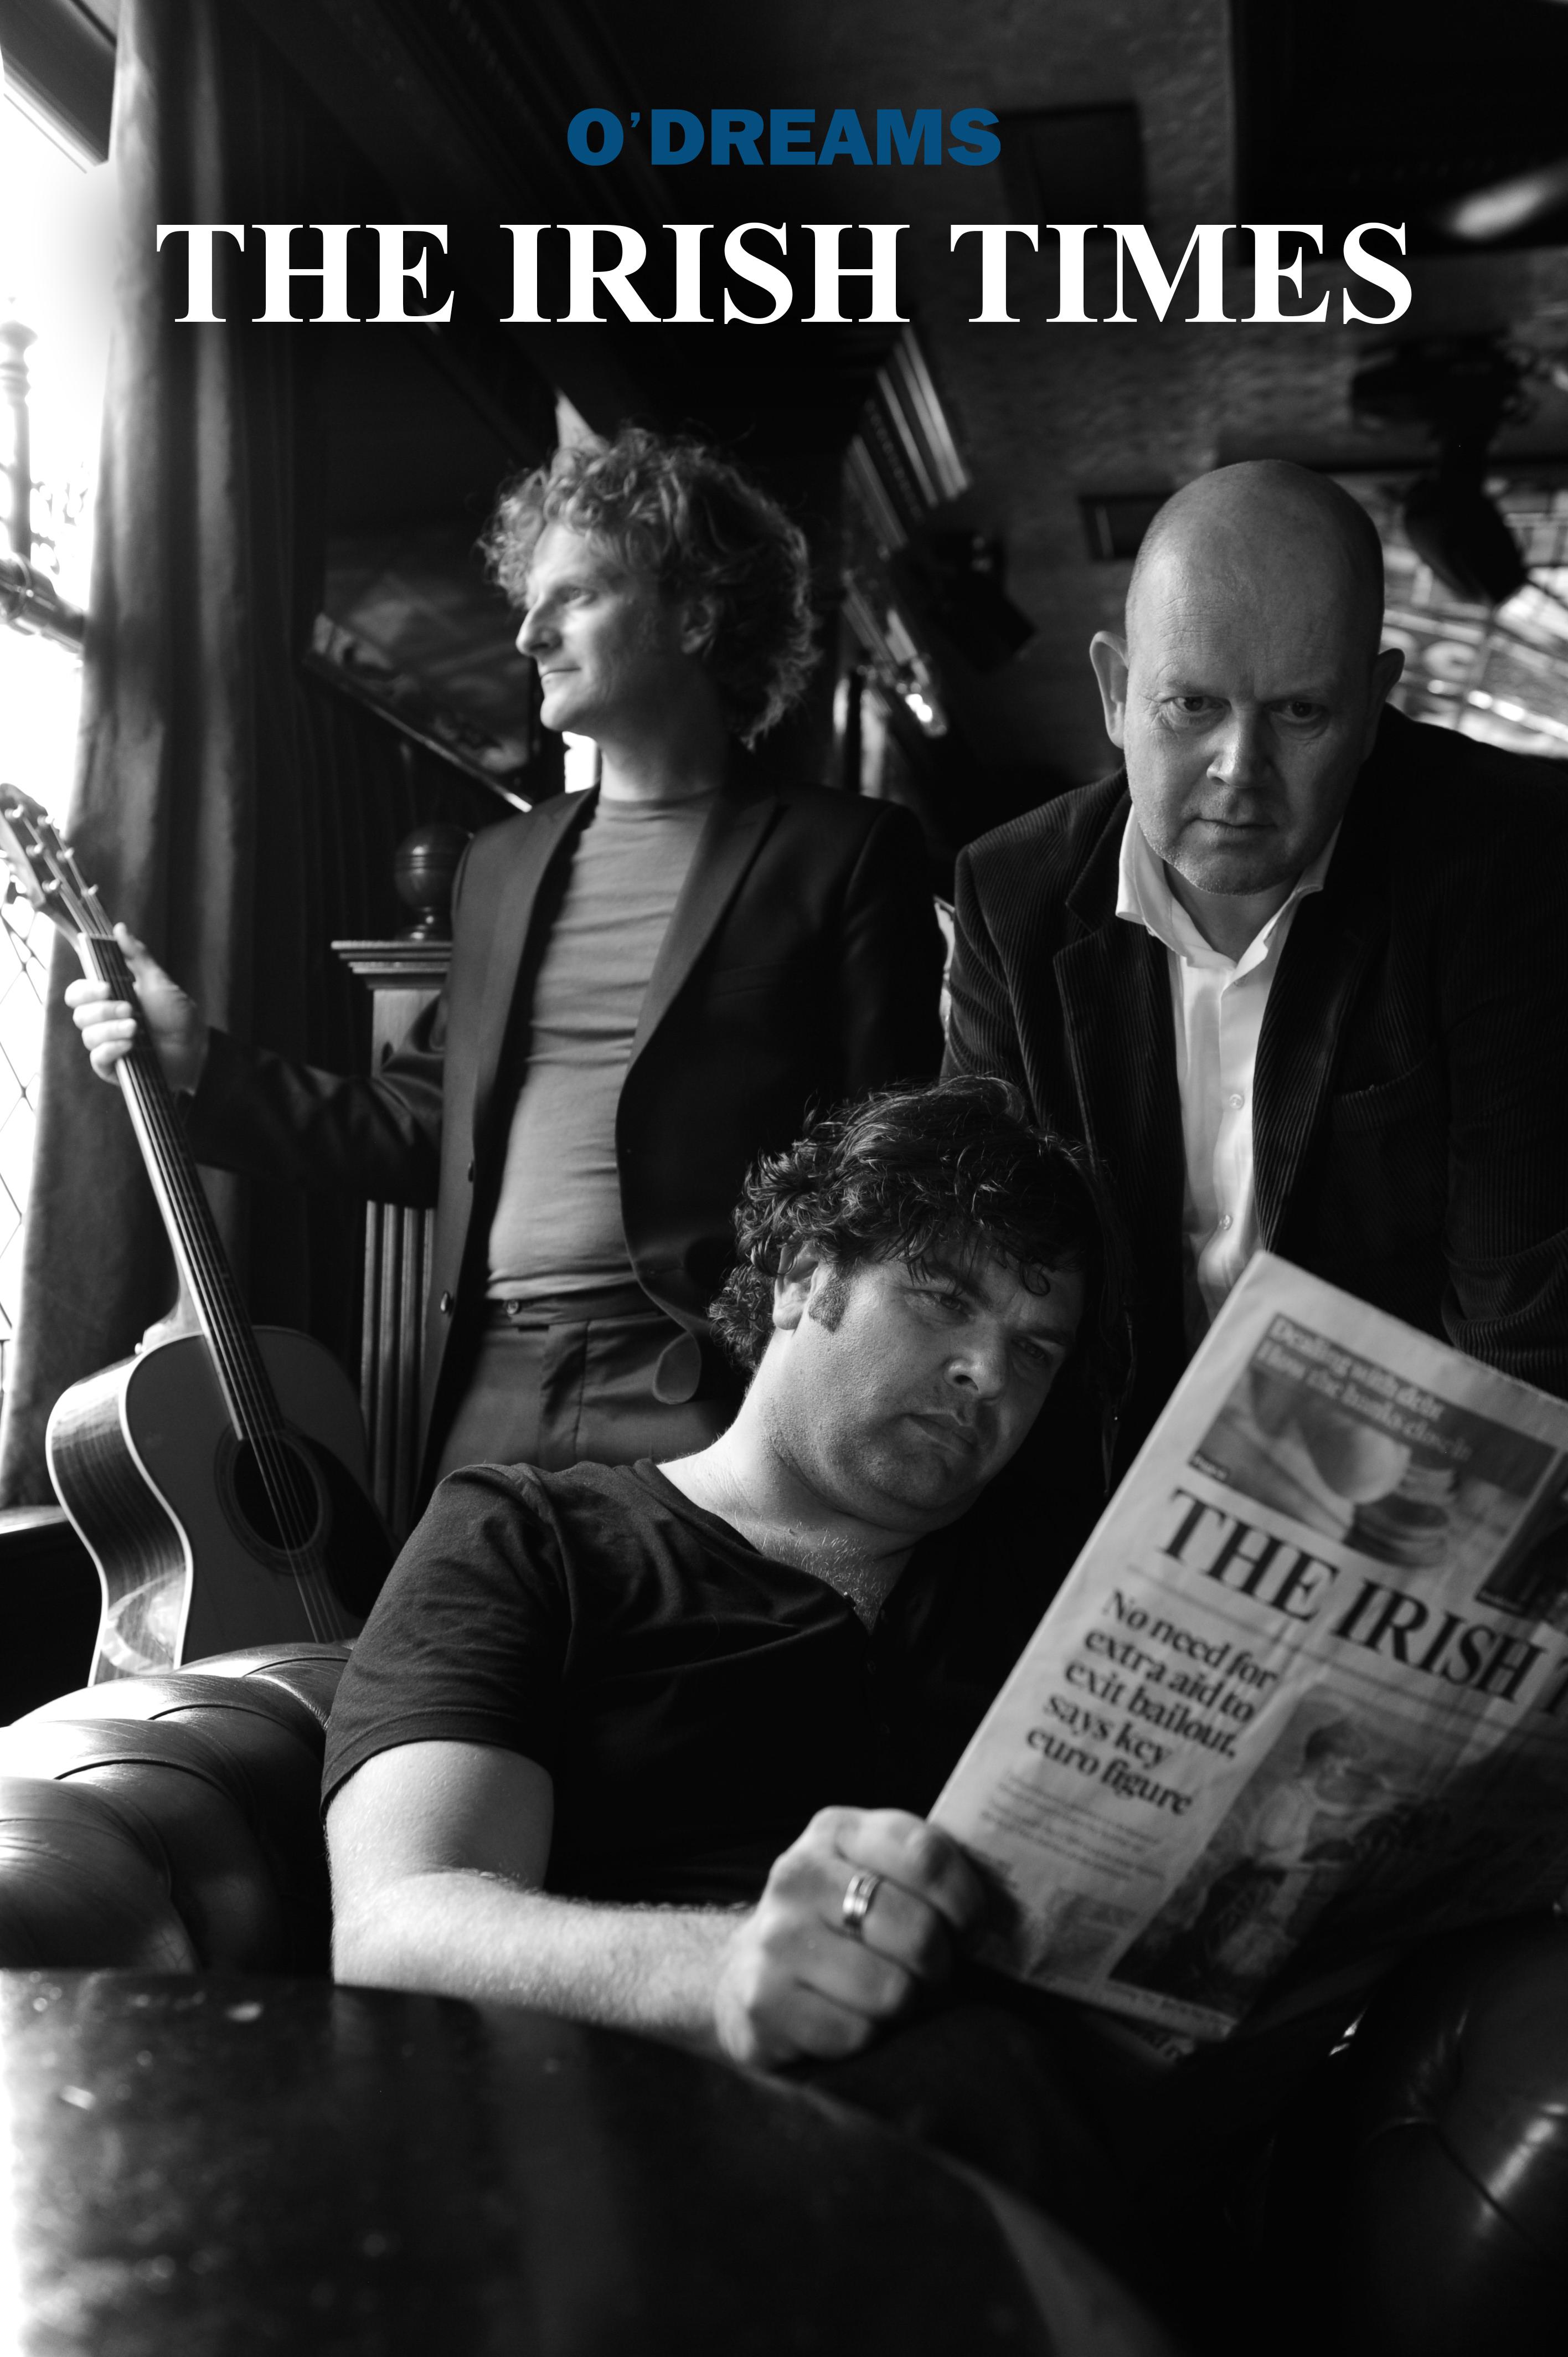 25 september 2020: O'Dreams ('The Irish Times')